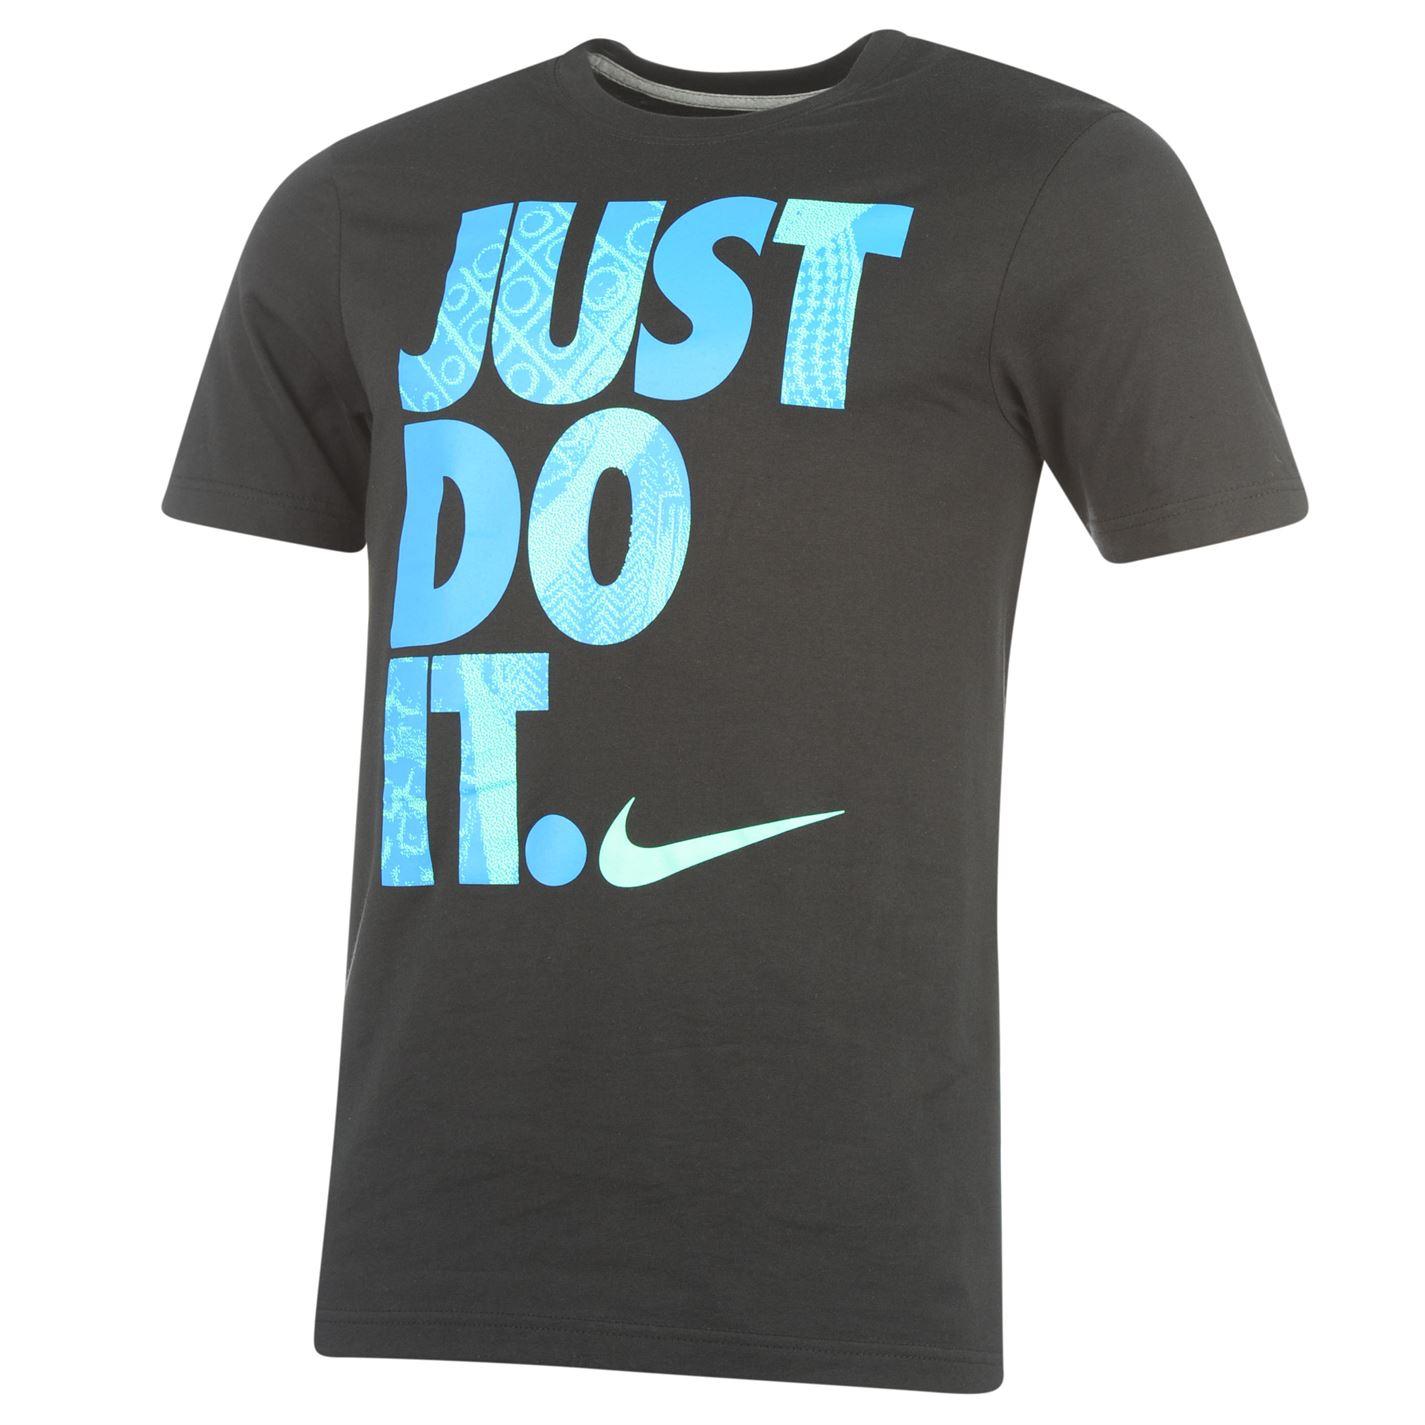 Nike Herren T-Shirt Just Do It Shirt S M L XL 2XL XXL ...